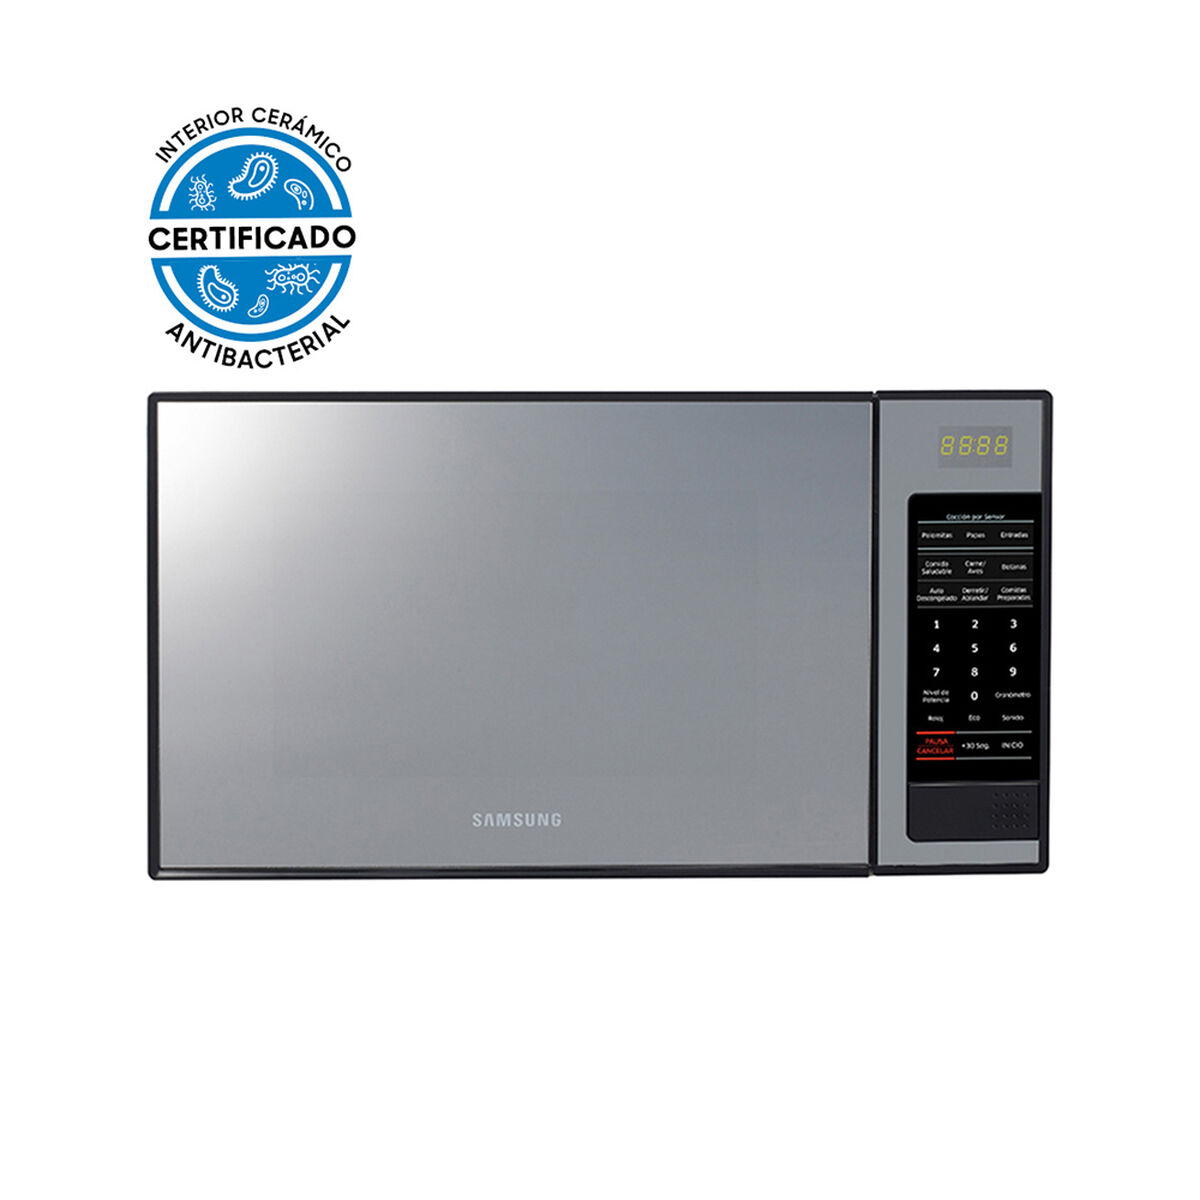 Microondas Samsung ME0113MB1/XZS 32 lt